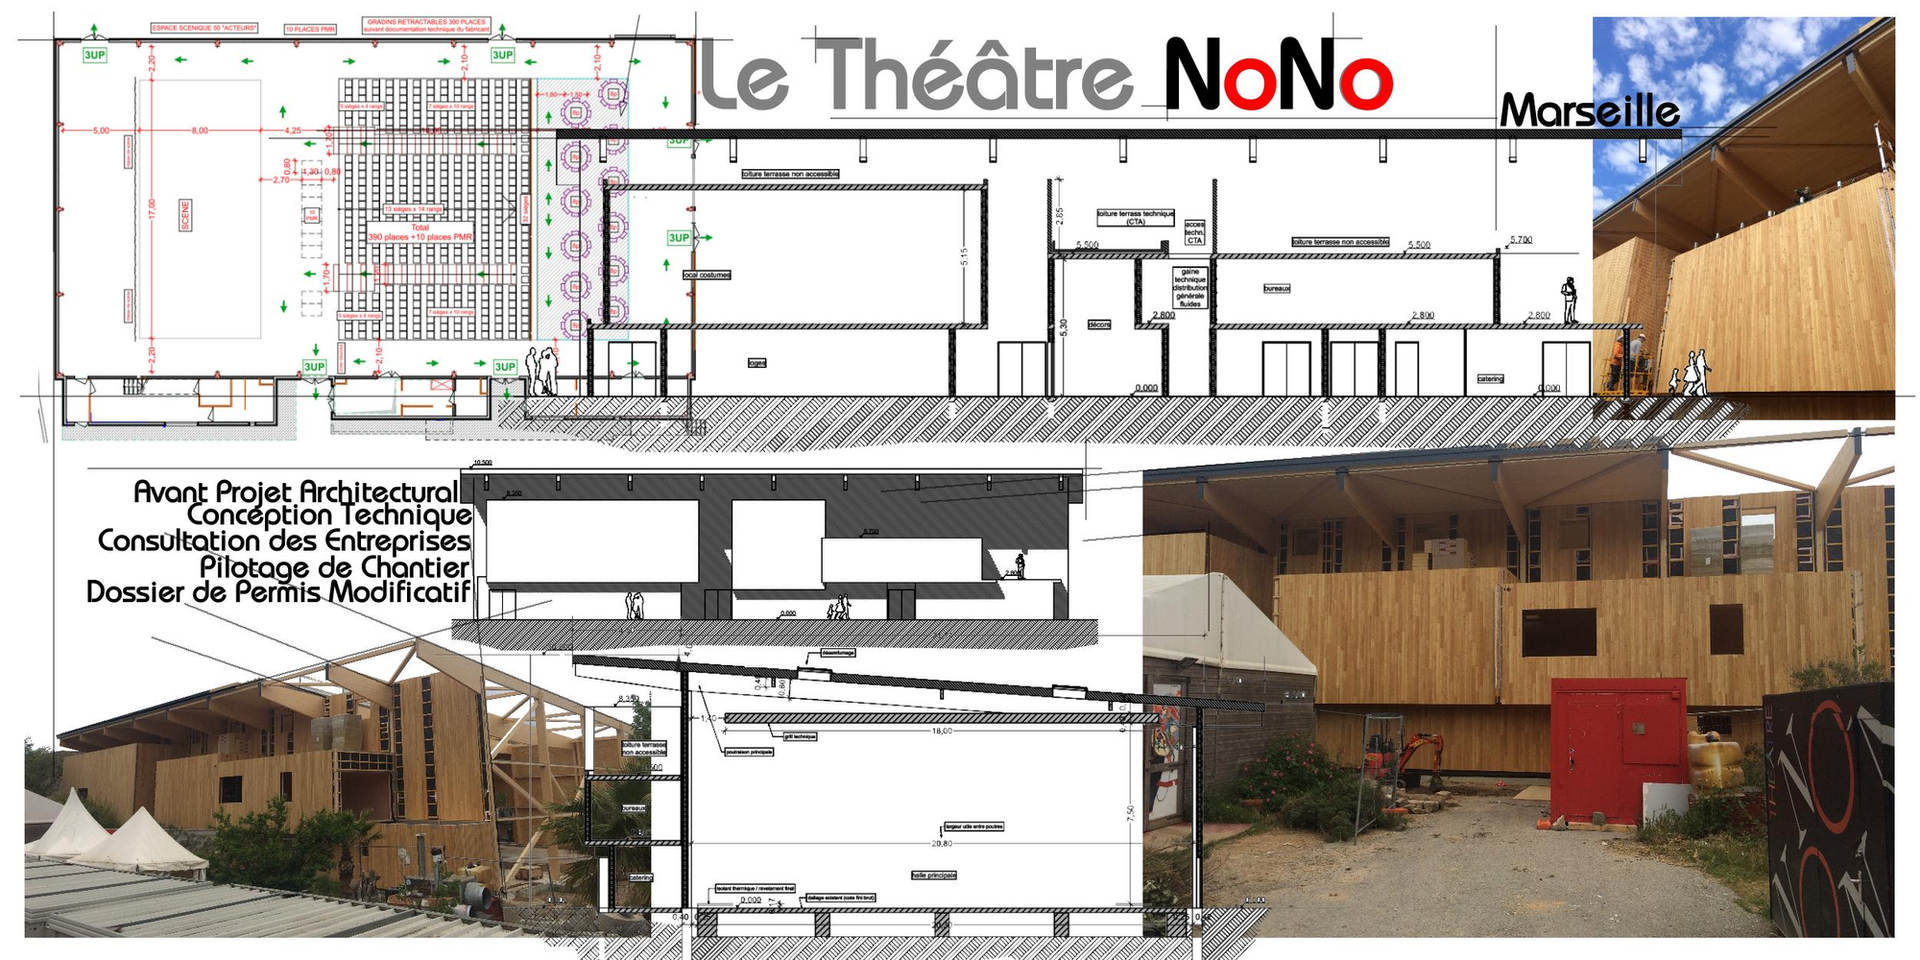 090-TH_NONO-V2.jpg